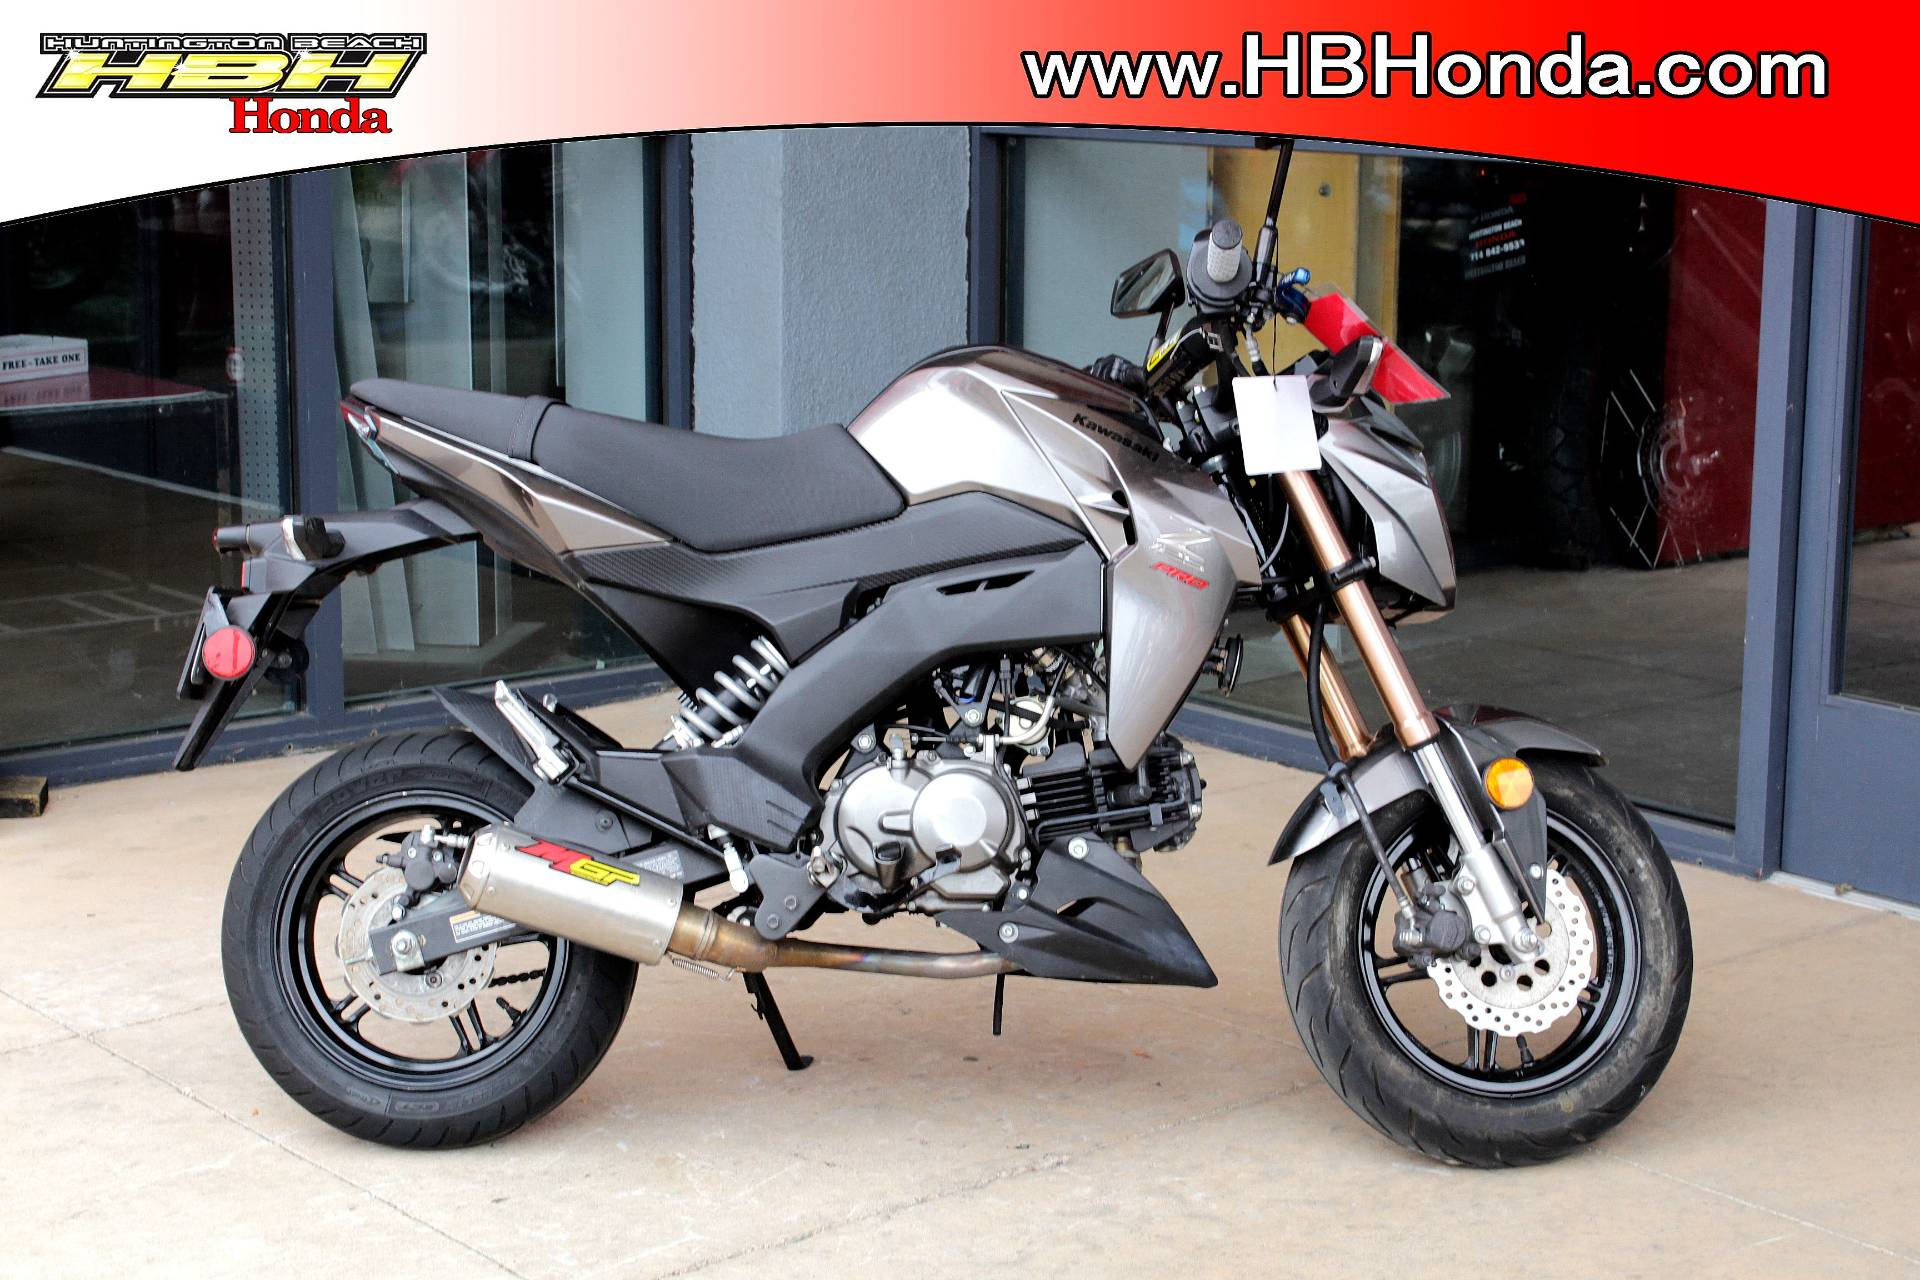 2017 Kawasaki Z125 Pro >> Used 2017 Kawasaki Z125 Pro Motorcycles For Sale In Huntington Beach